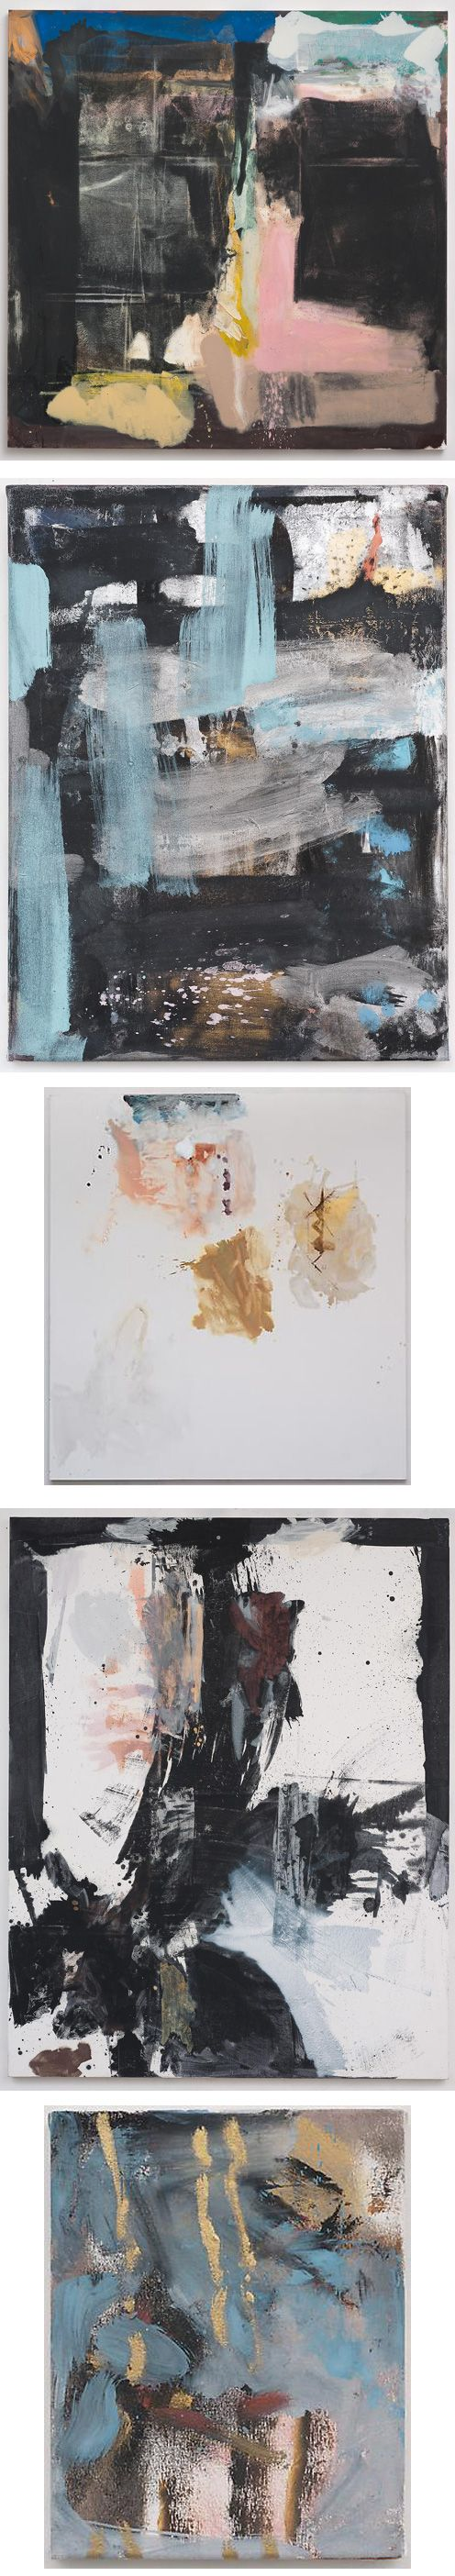 The work of Caitlin Lonegan  via http://www.acmelosangeles.com/artists/caitlin-lonegan/#4